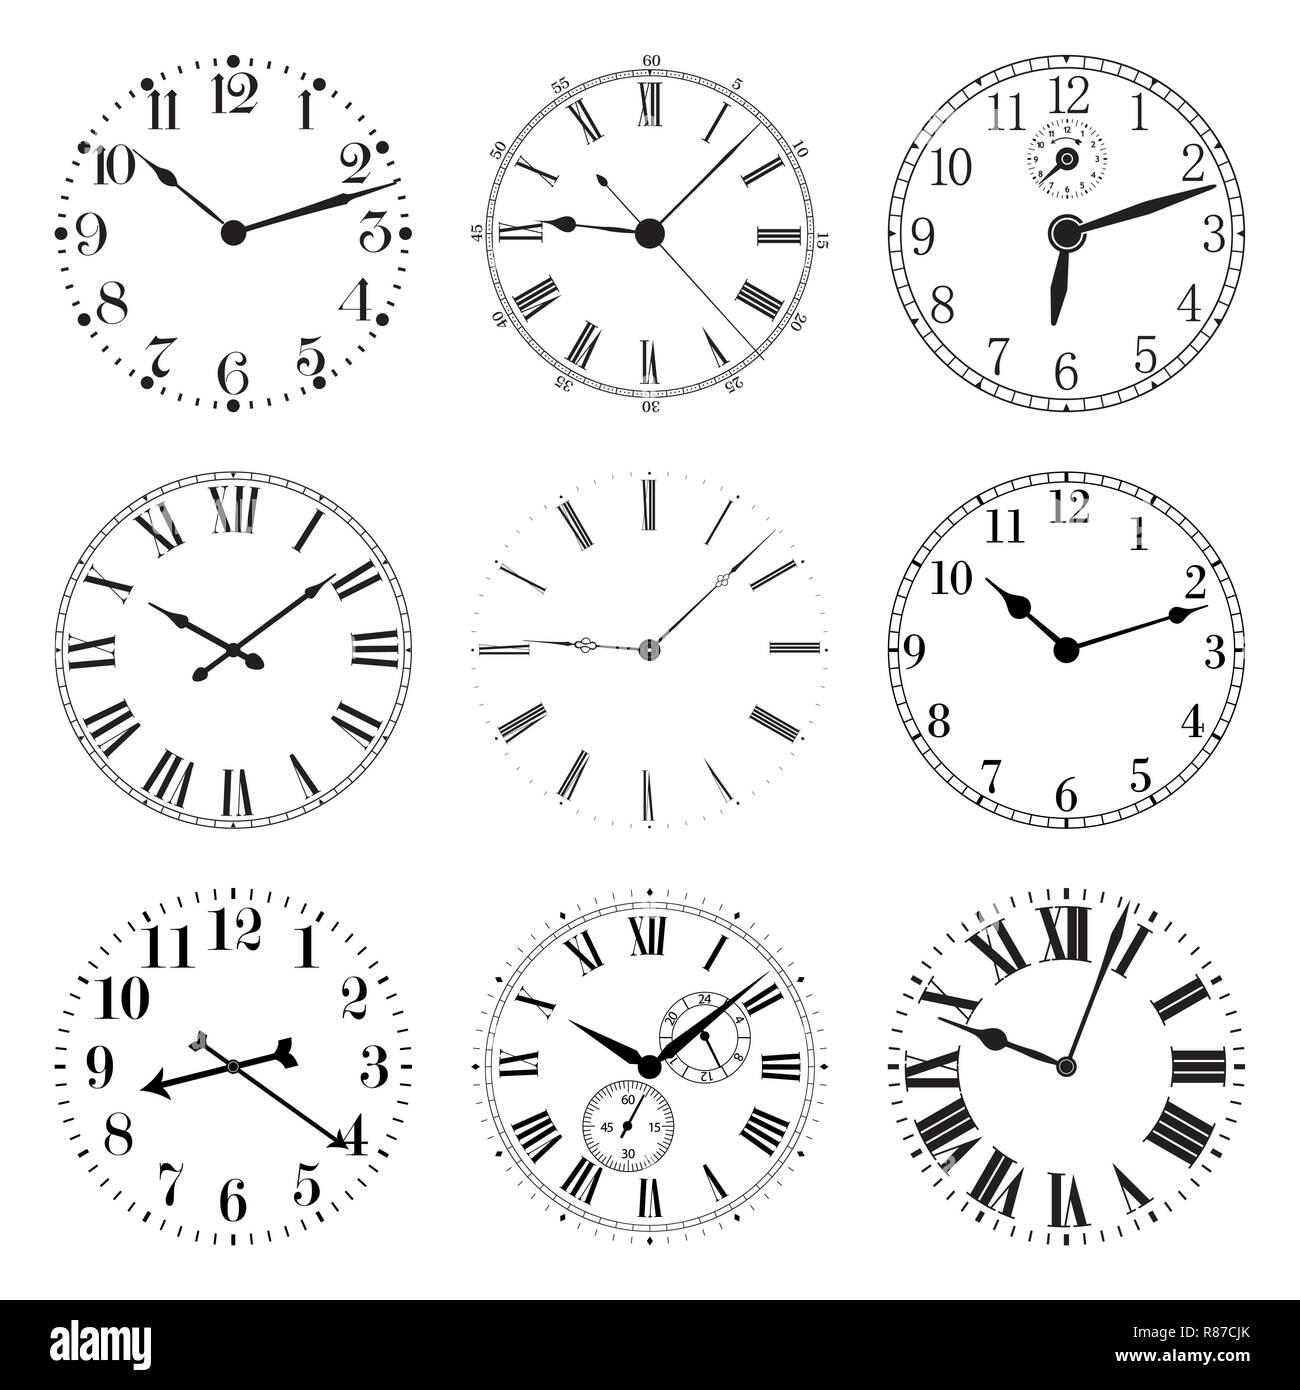 Set of Clocks. Vector illustration isolated on white background. - Stock Image